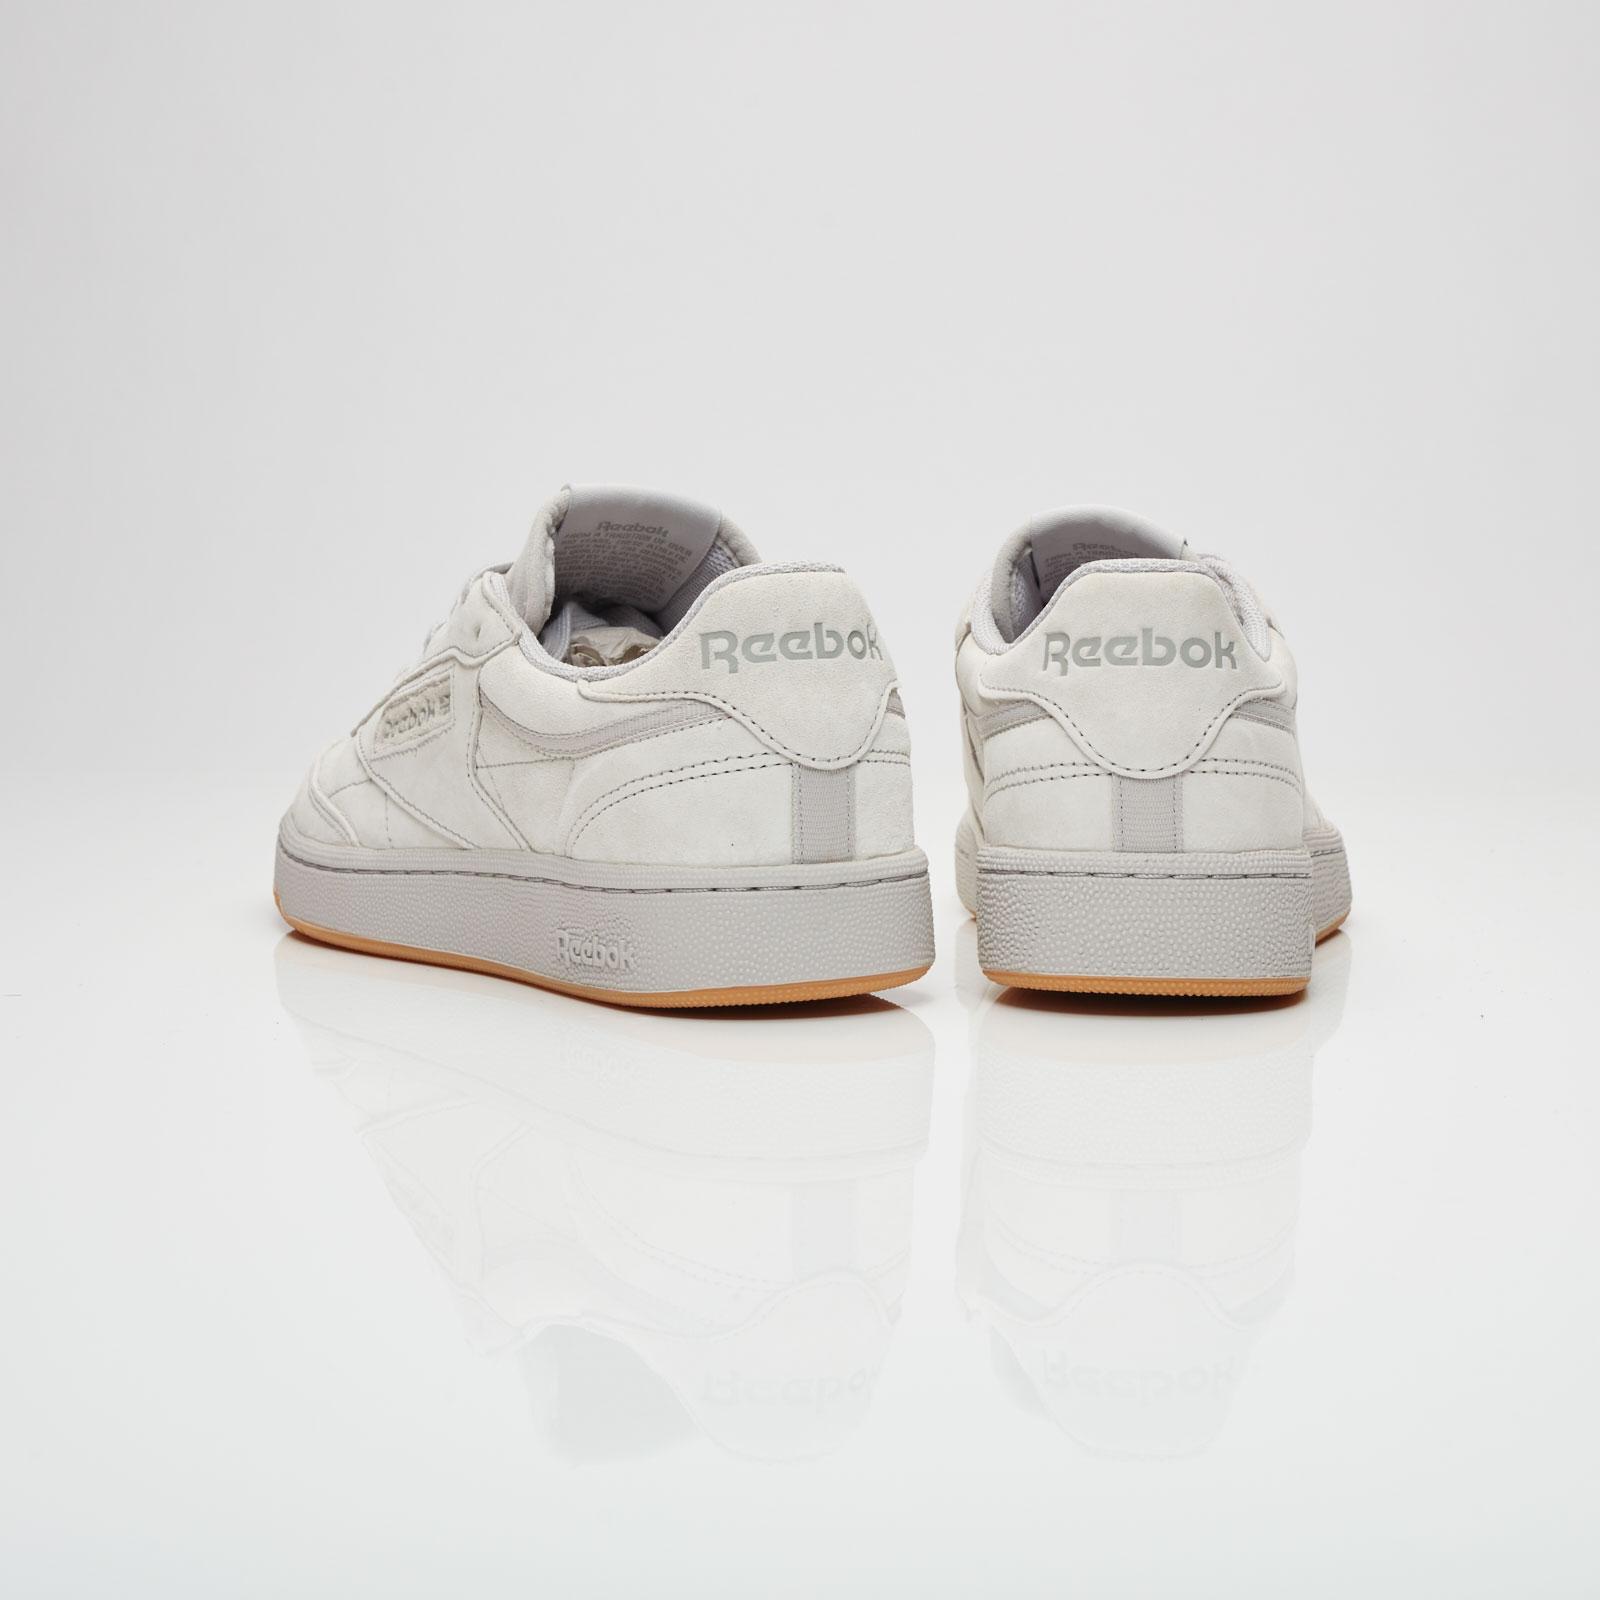 Reebok Club C 85 Tg - Bd1886 - Sneakersnstuff  421300c77